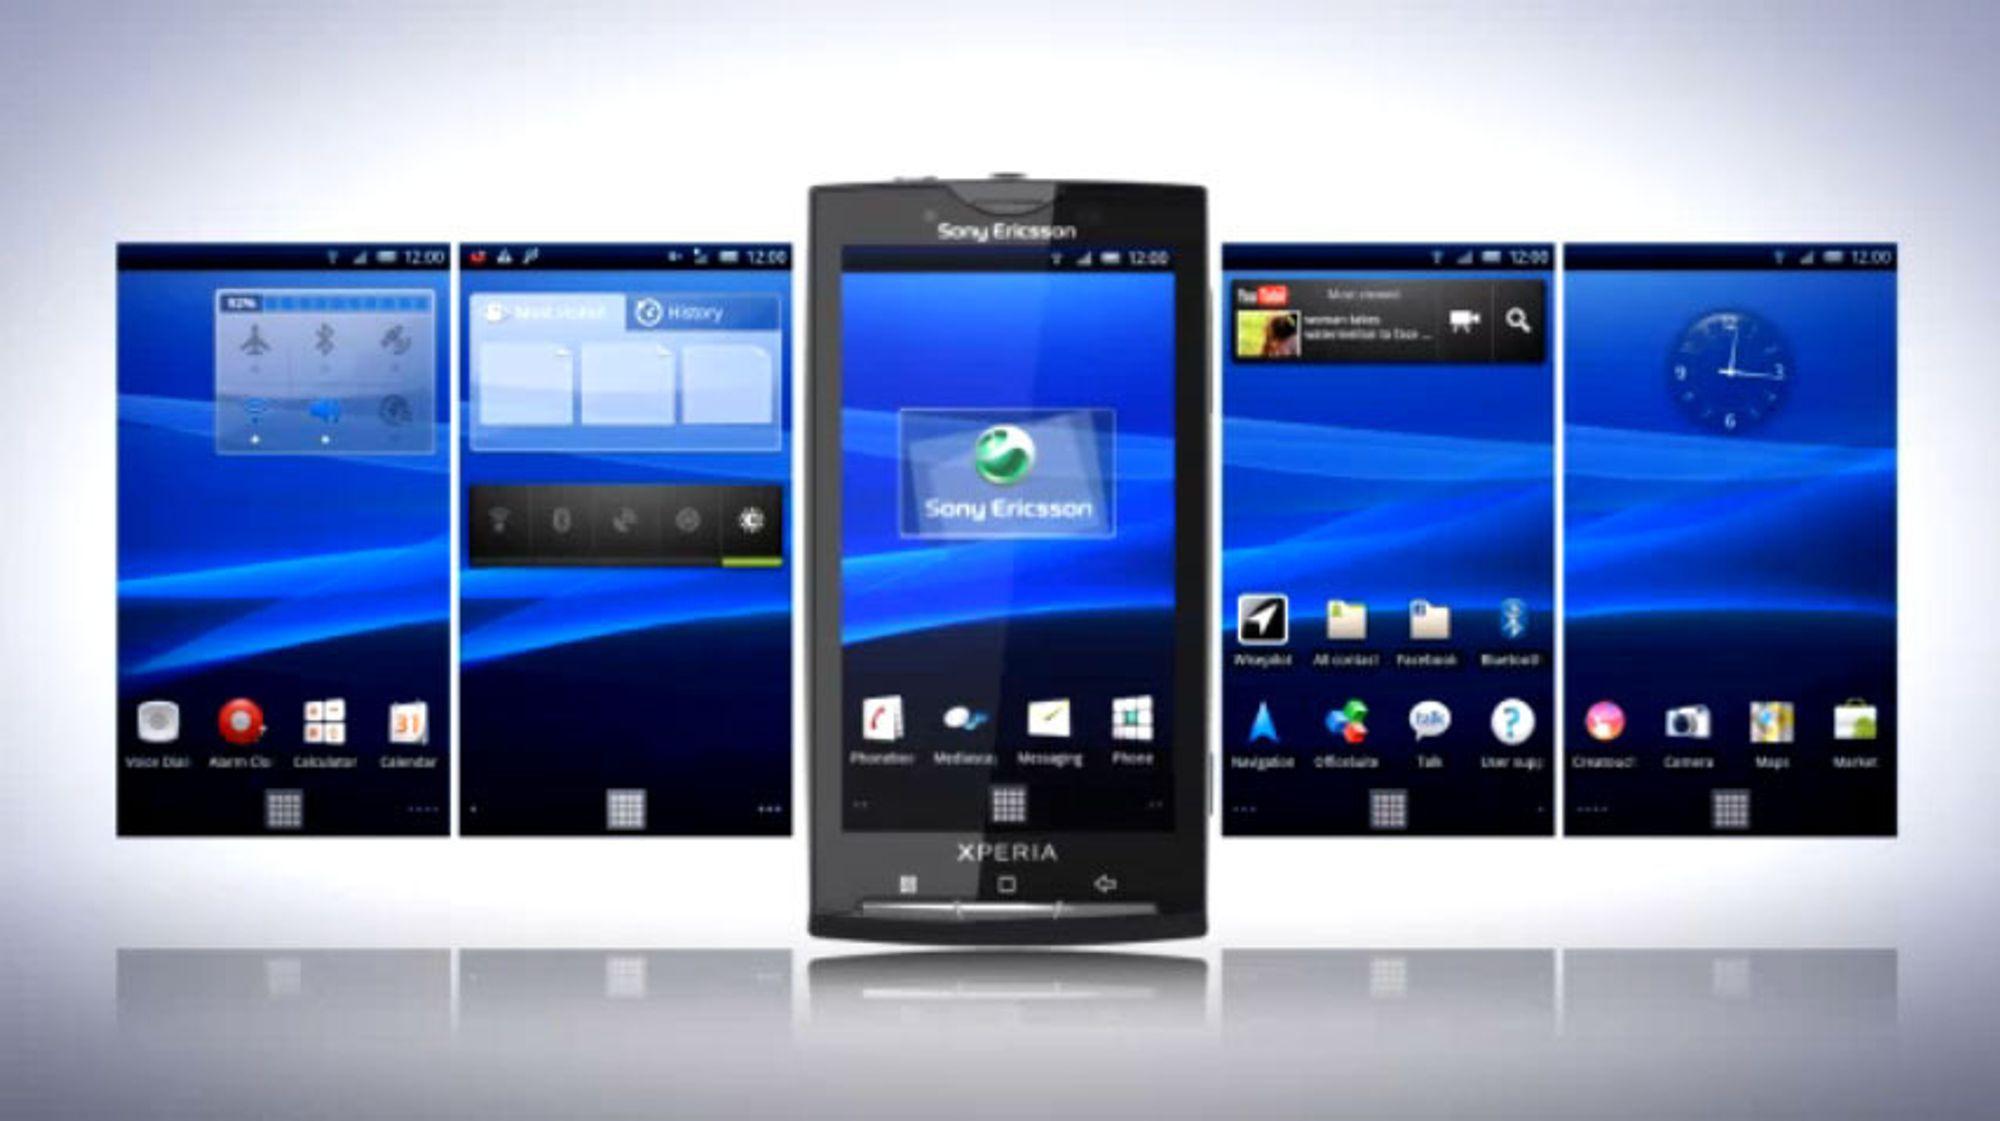 Her er nyhetene i Android 2.1 for Xperia X10